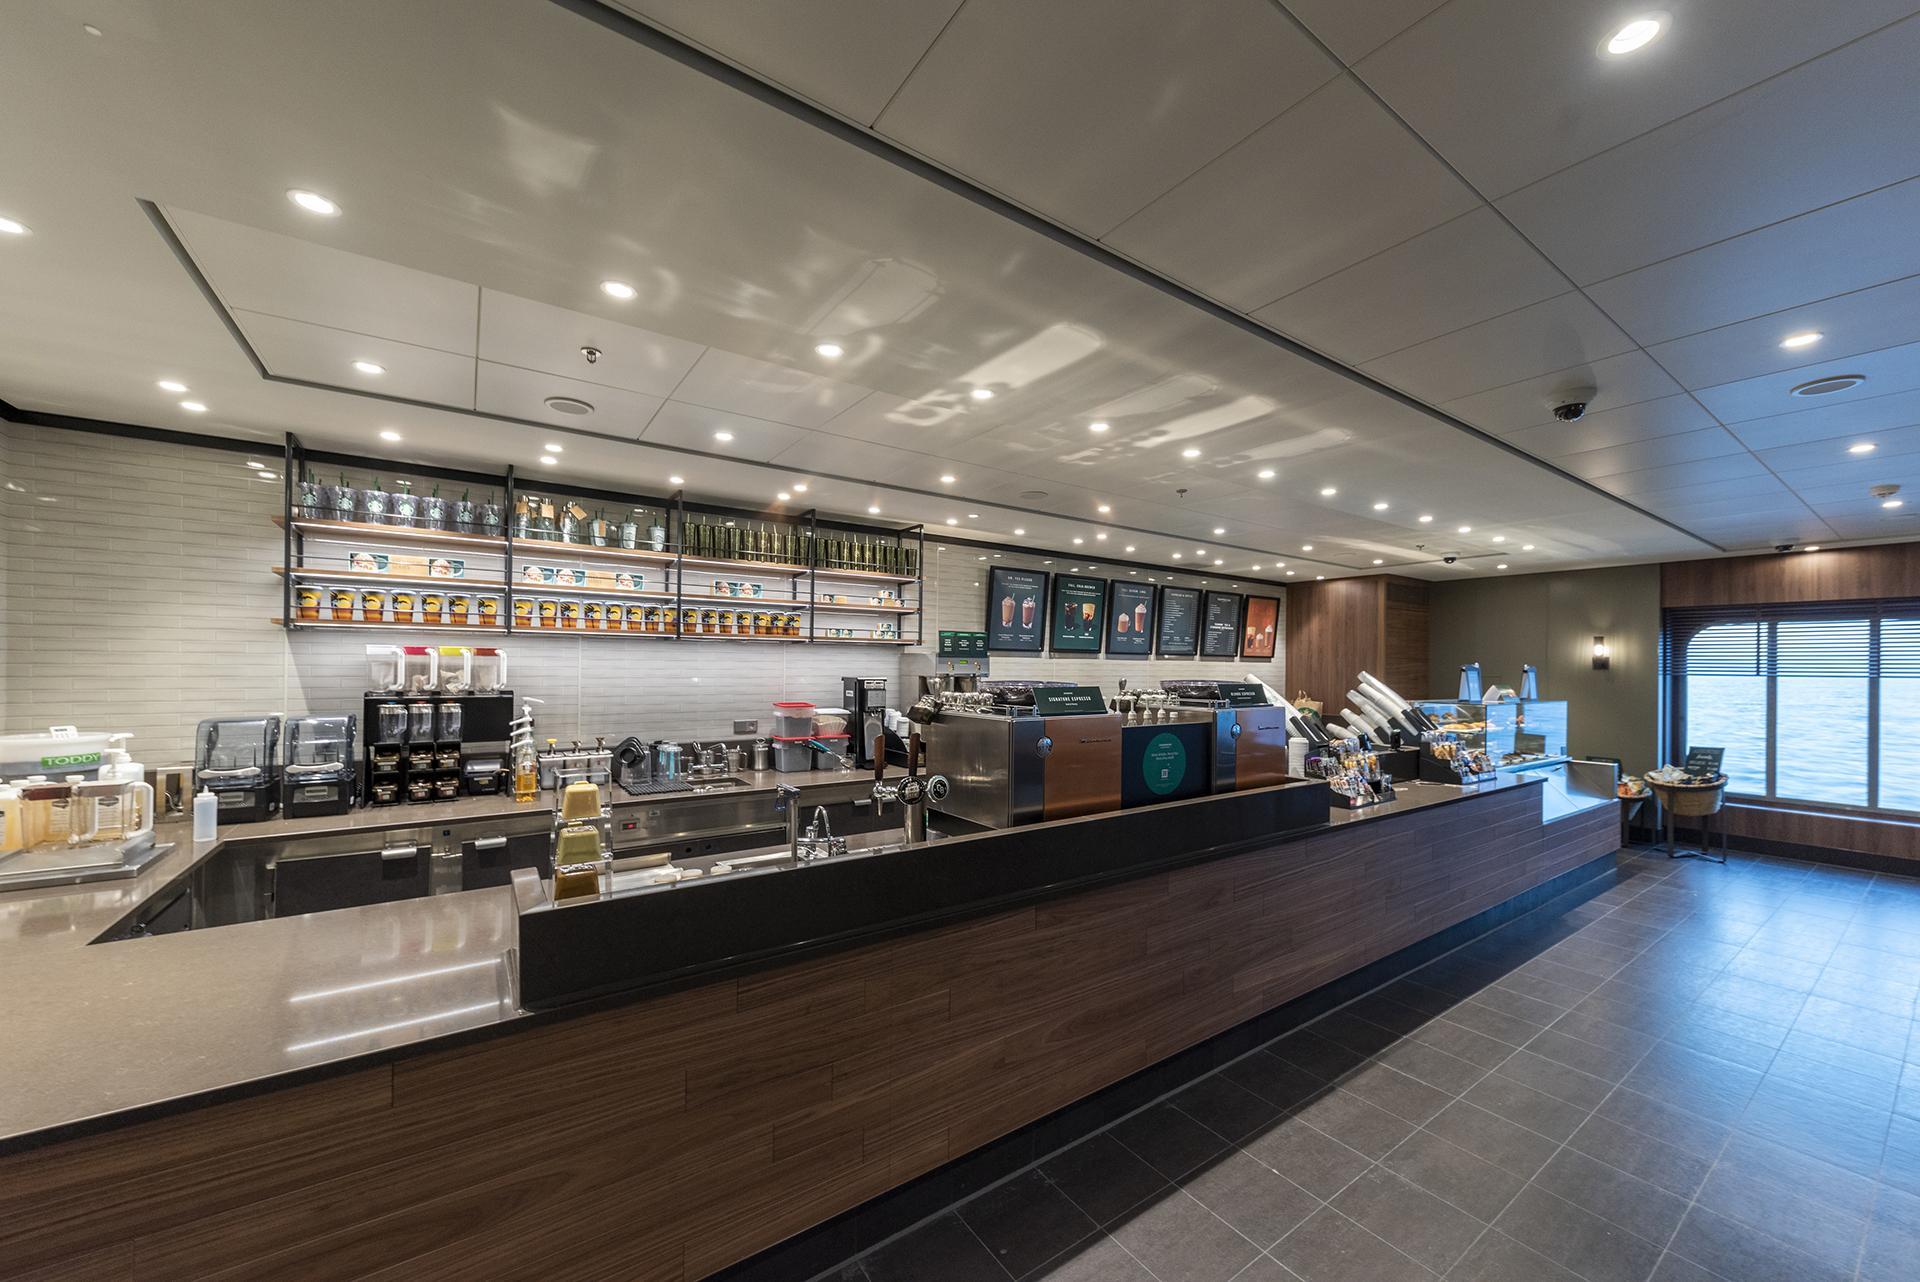 steinwerk_friedeburg_Starbucks_02